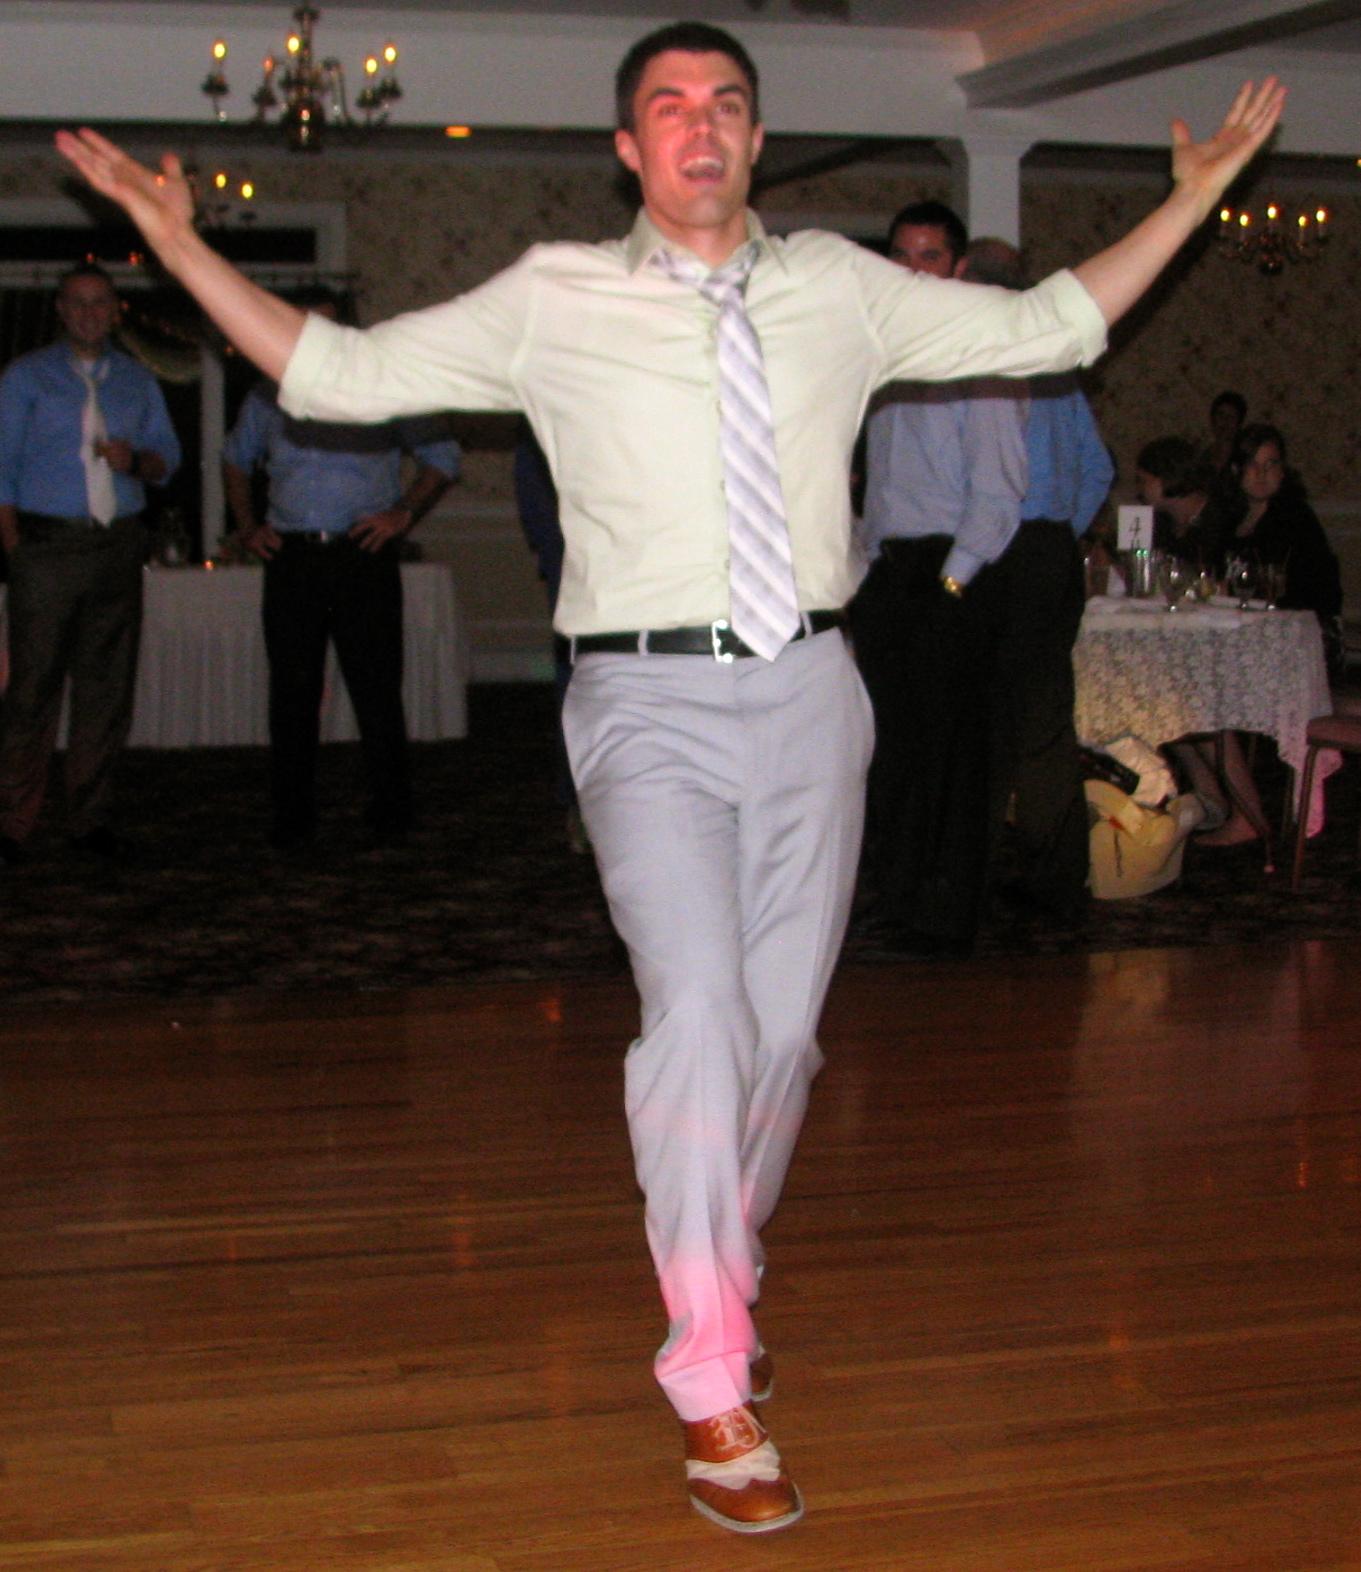 Rhode Island Wedding Djfun: DJ Mystical Michael Rhode